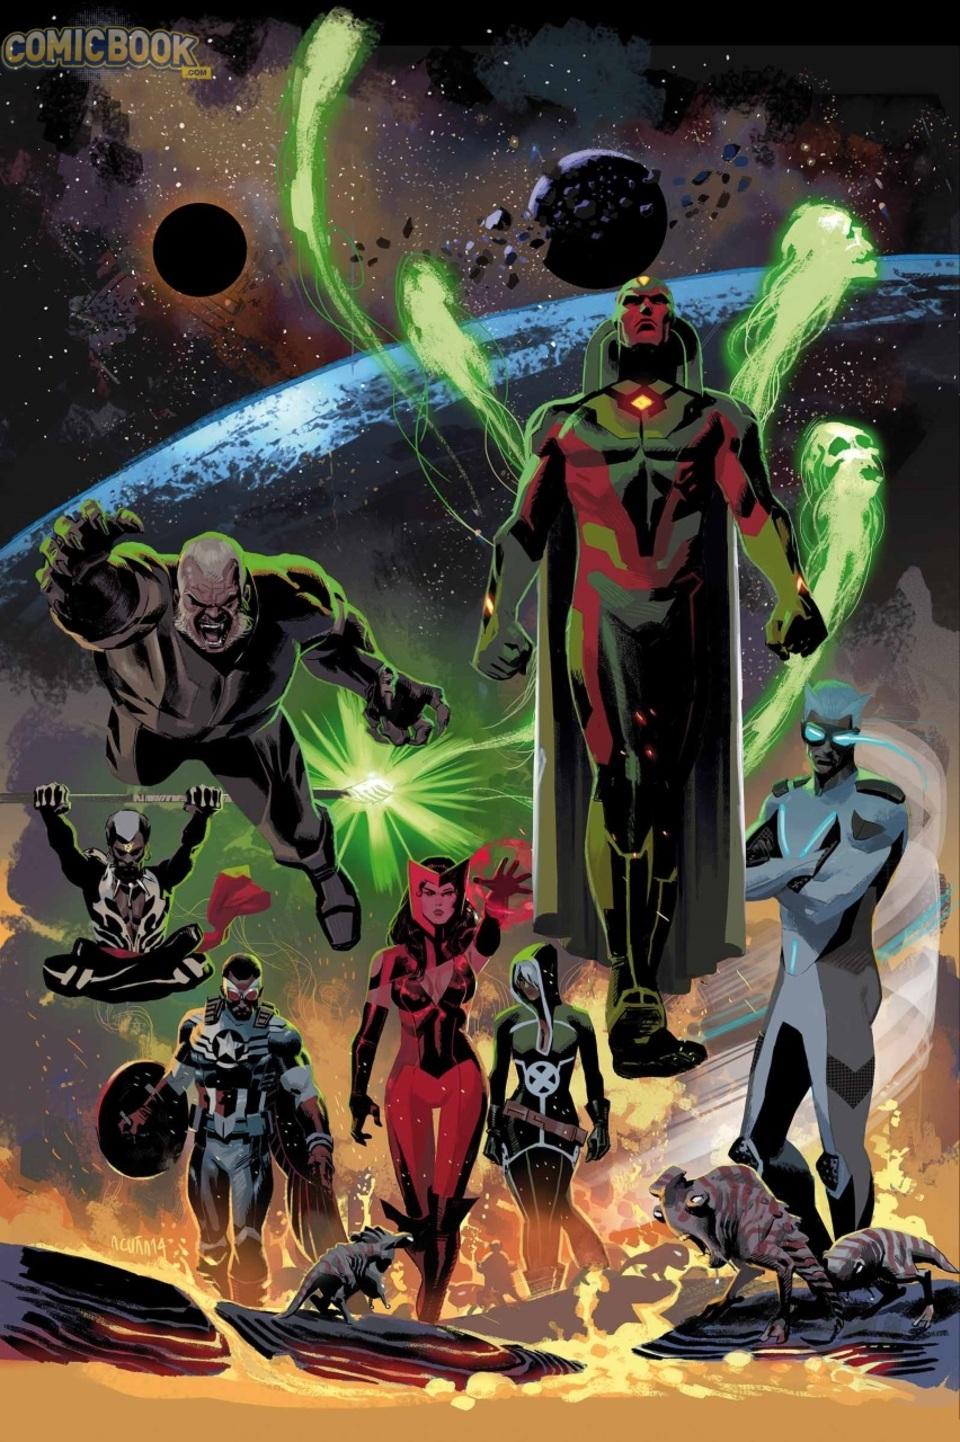 New Uncanny Avengers team